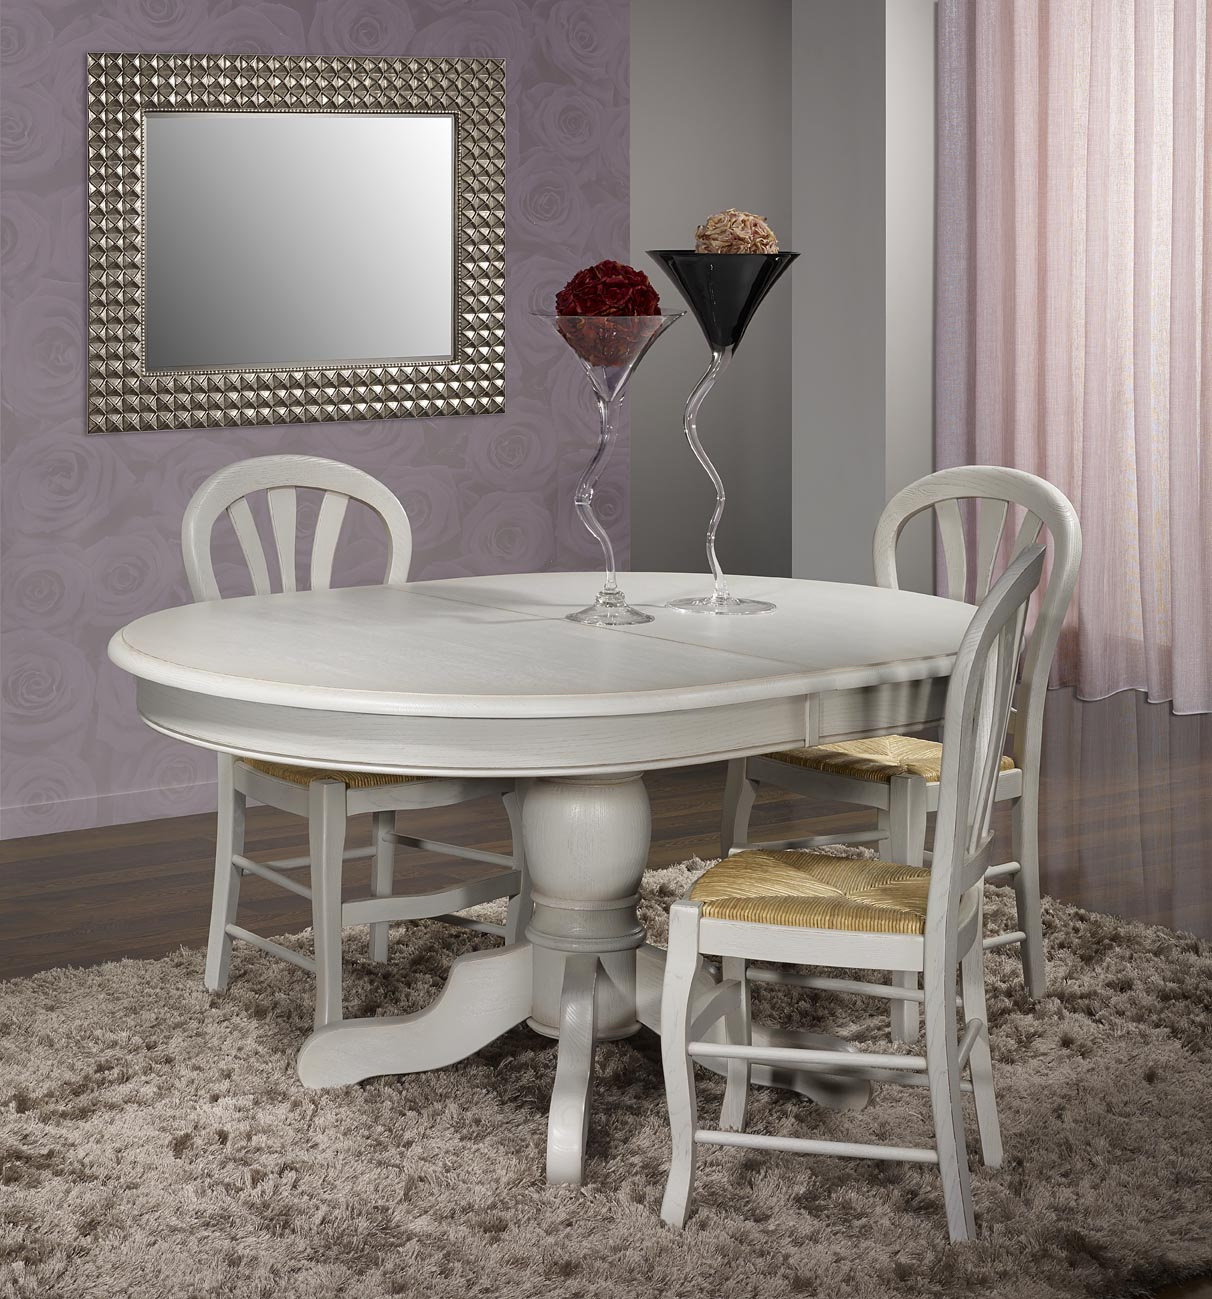 Table Ovale Pied Central Romain En Ch Ne Massif De Style Louis  # Meuble De Tele Ovale